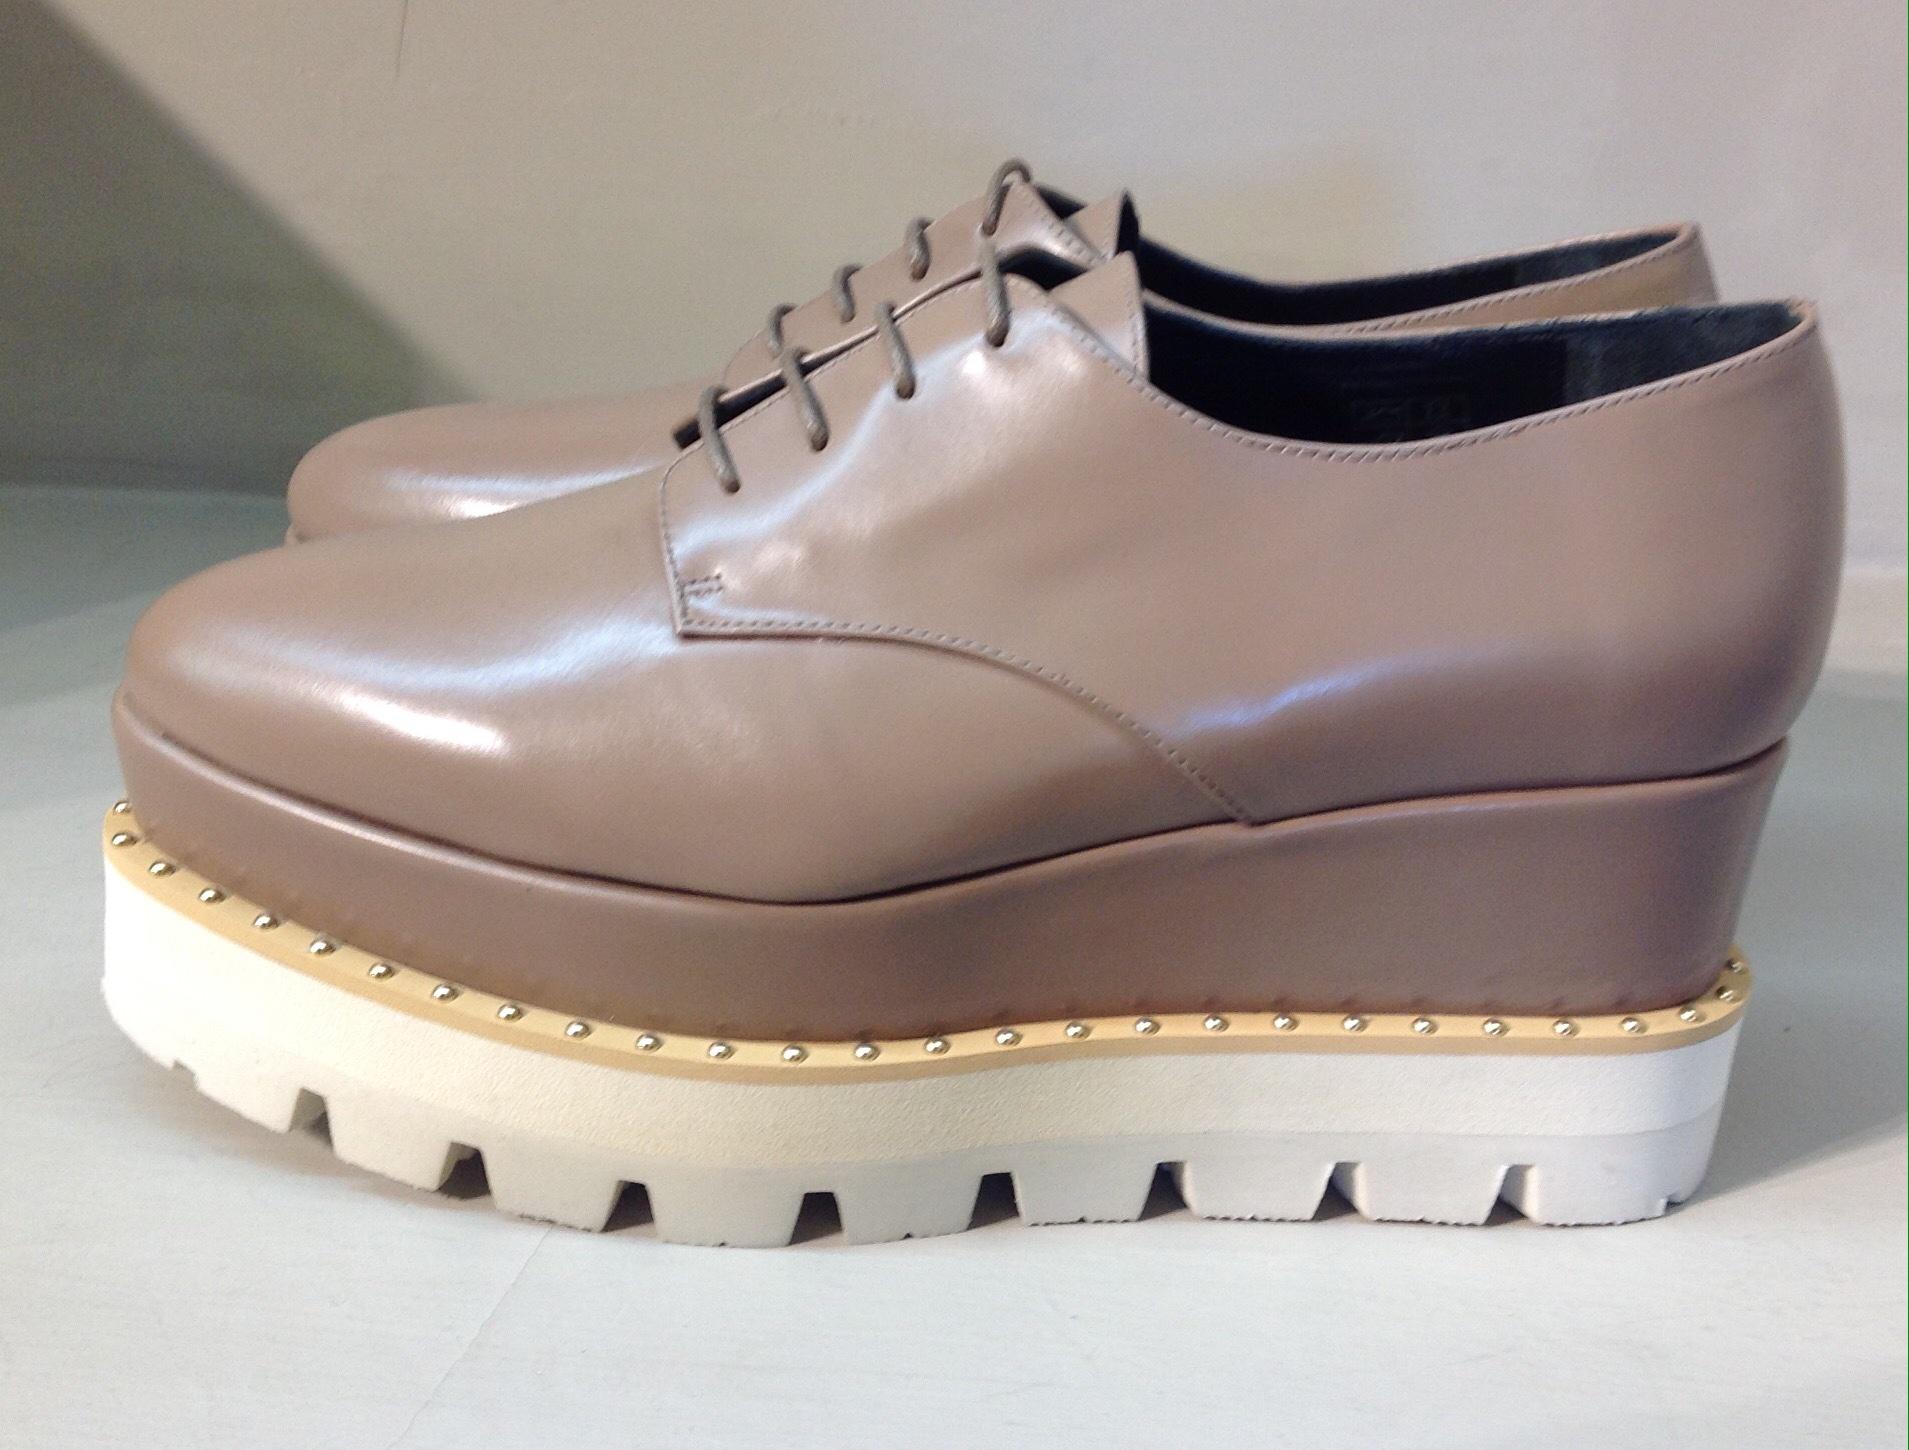 timeless design 9a5c5 aea72 PALOMA BARCELO' scarpa PALOMA BARCELO': Marica Impronta Shop Online...